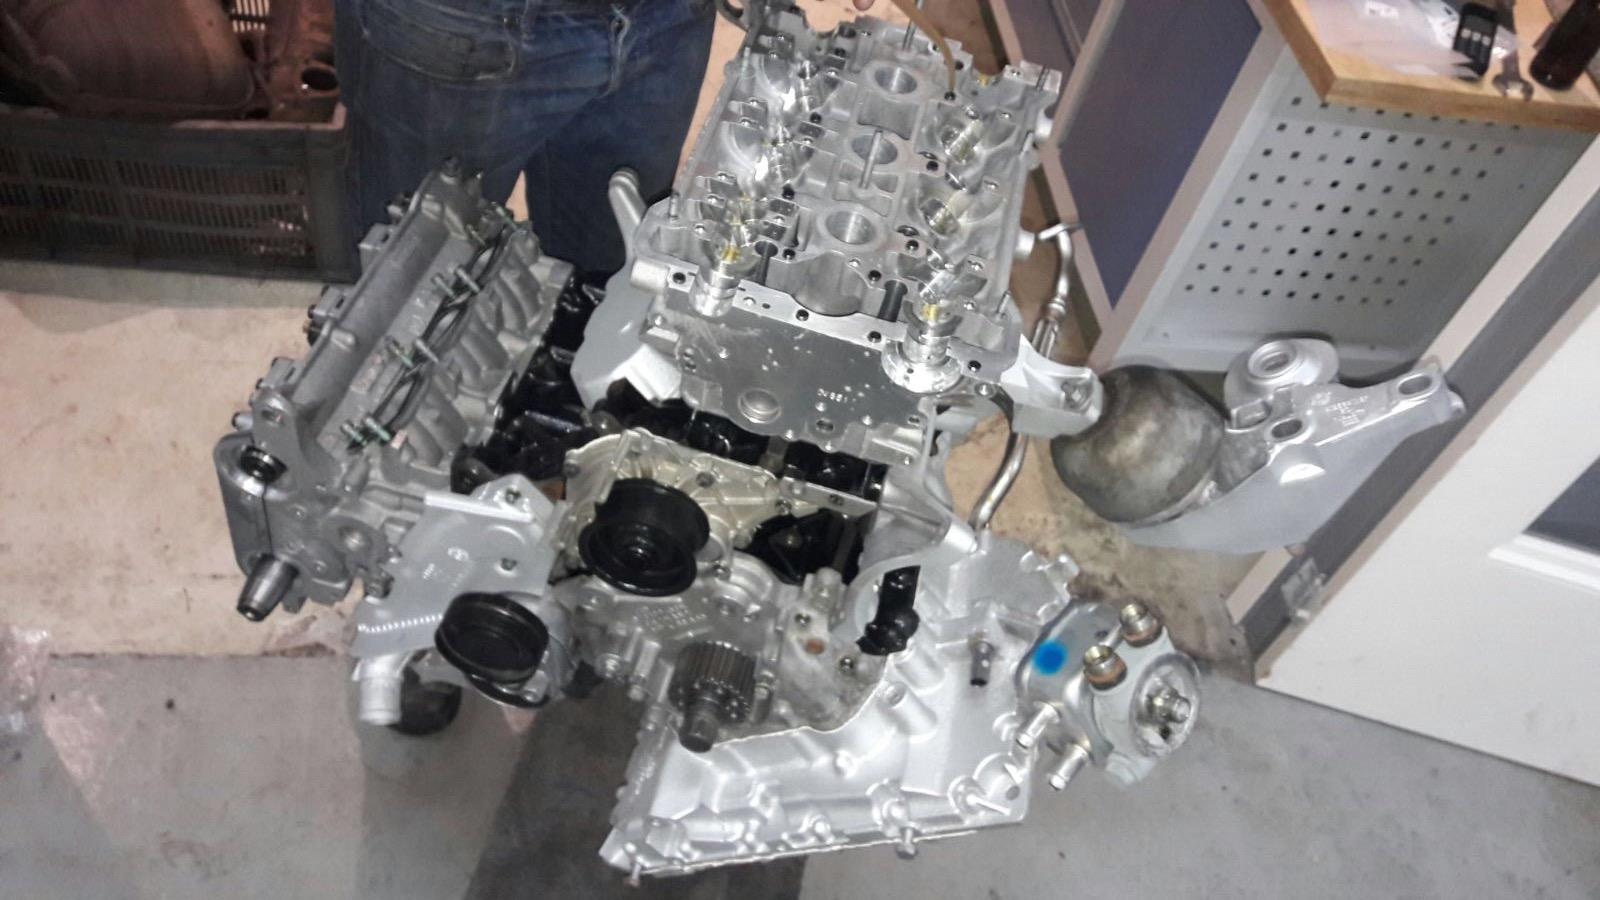 Big progress on the engine